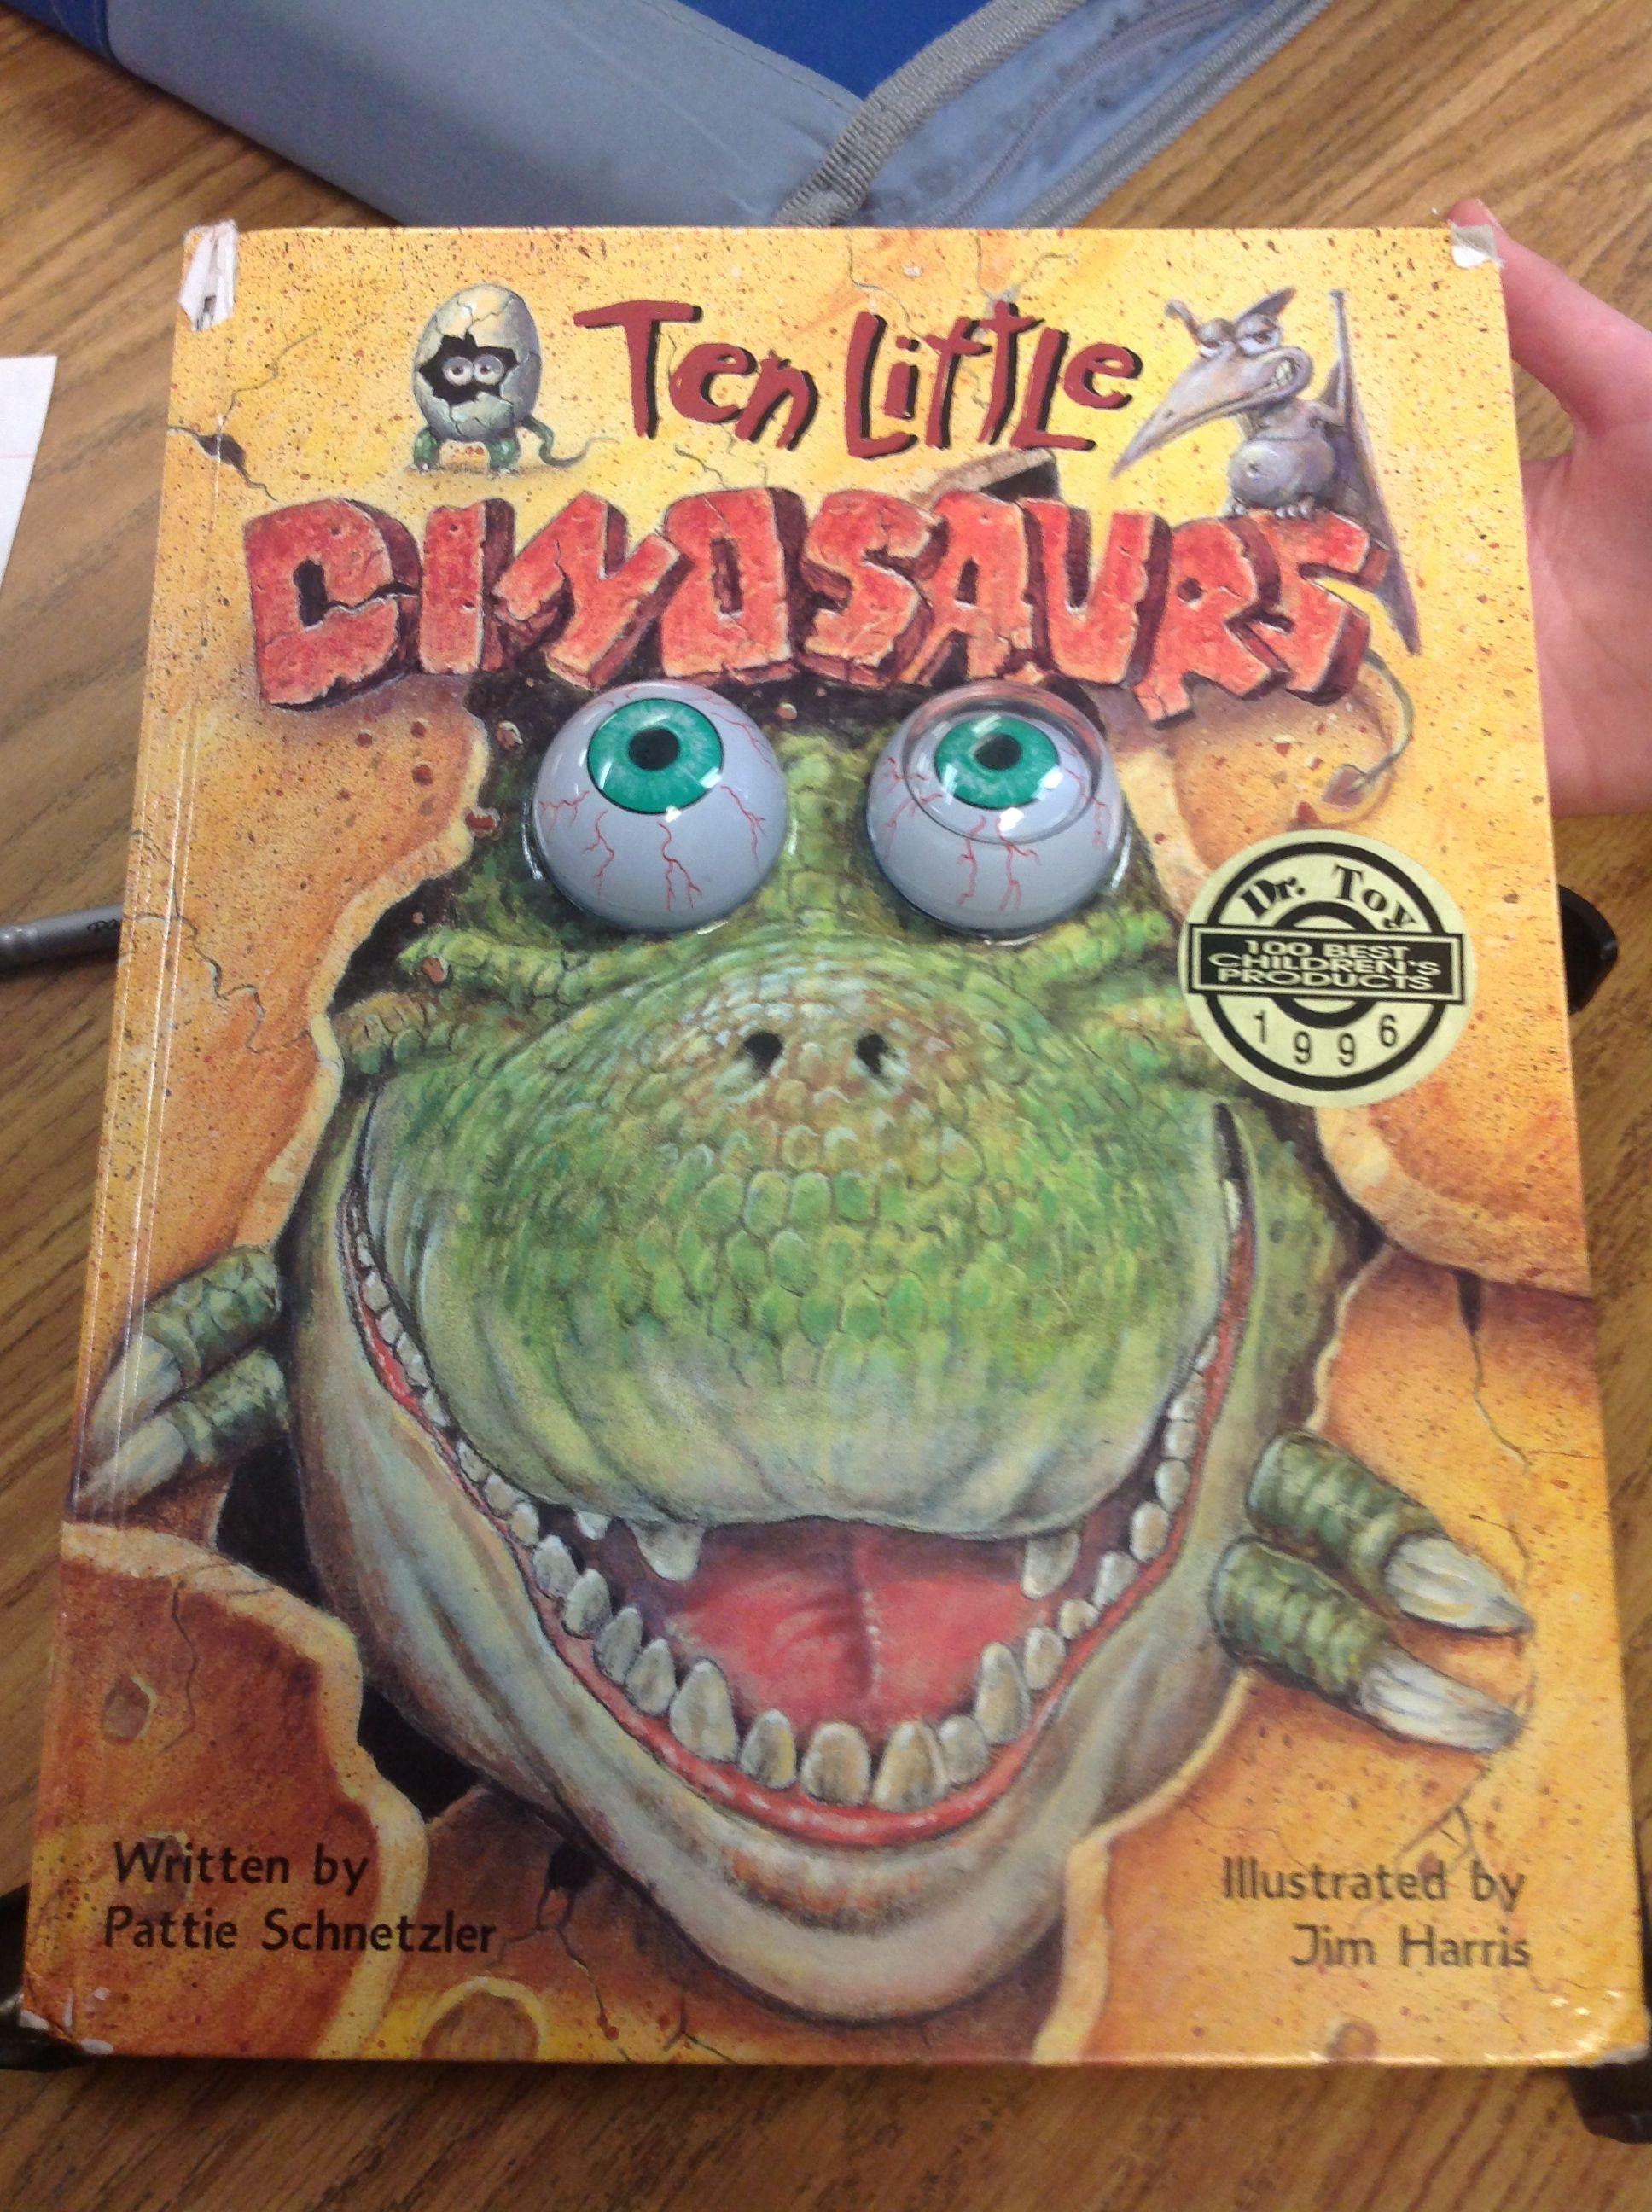 My Book Is Ten Little Dinosaurs Ten Little Dinosaurs Is